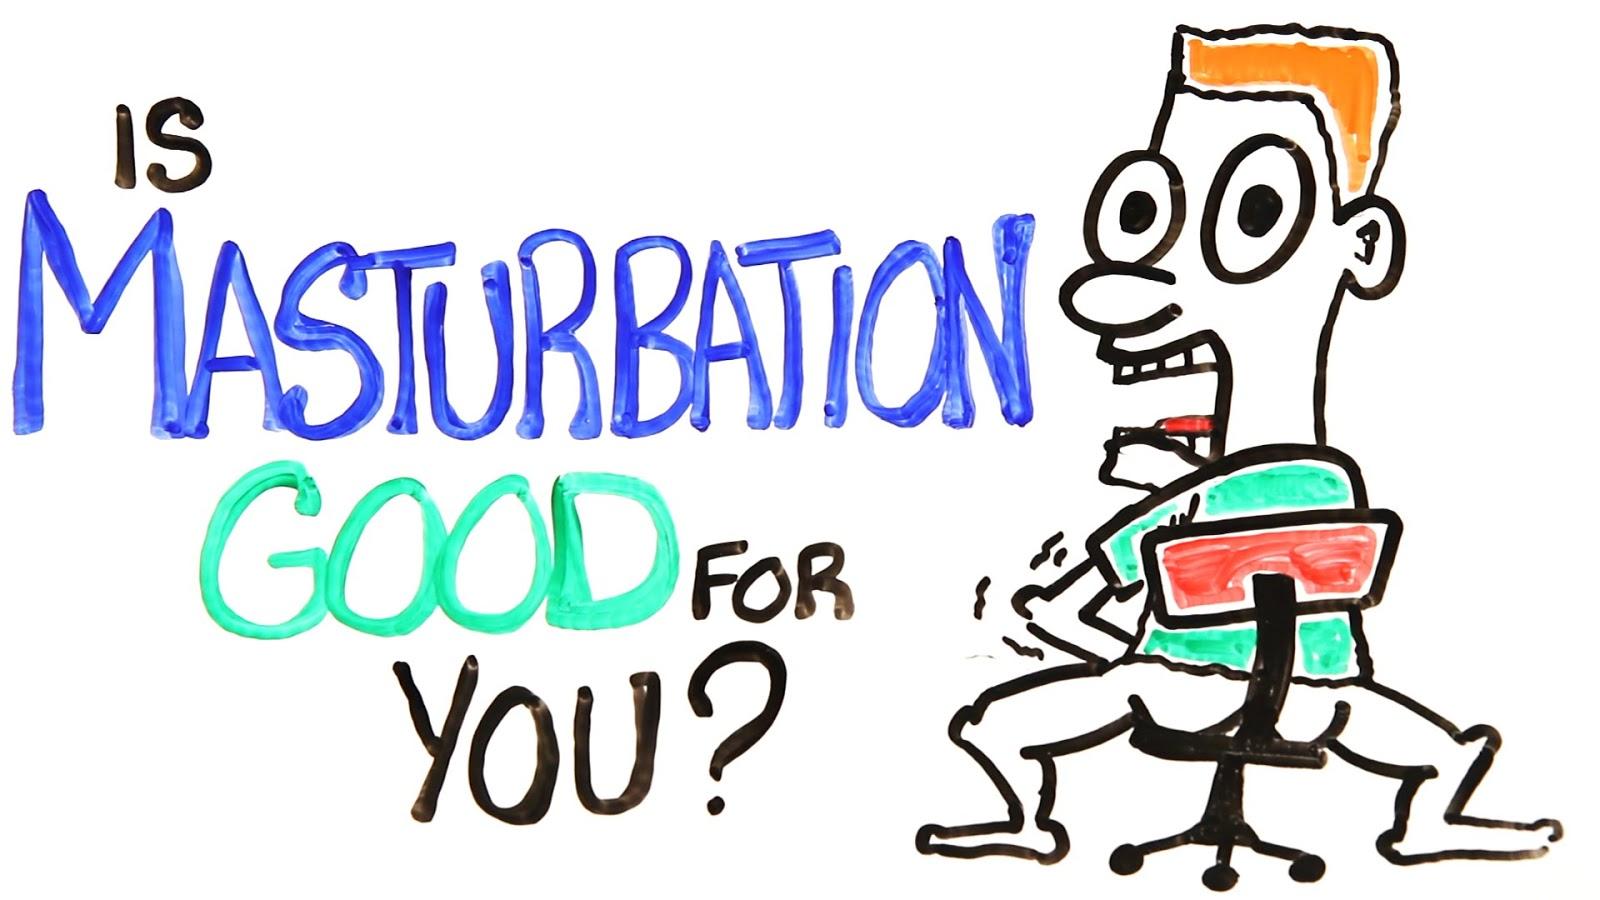 is masturbation good or bad